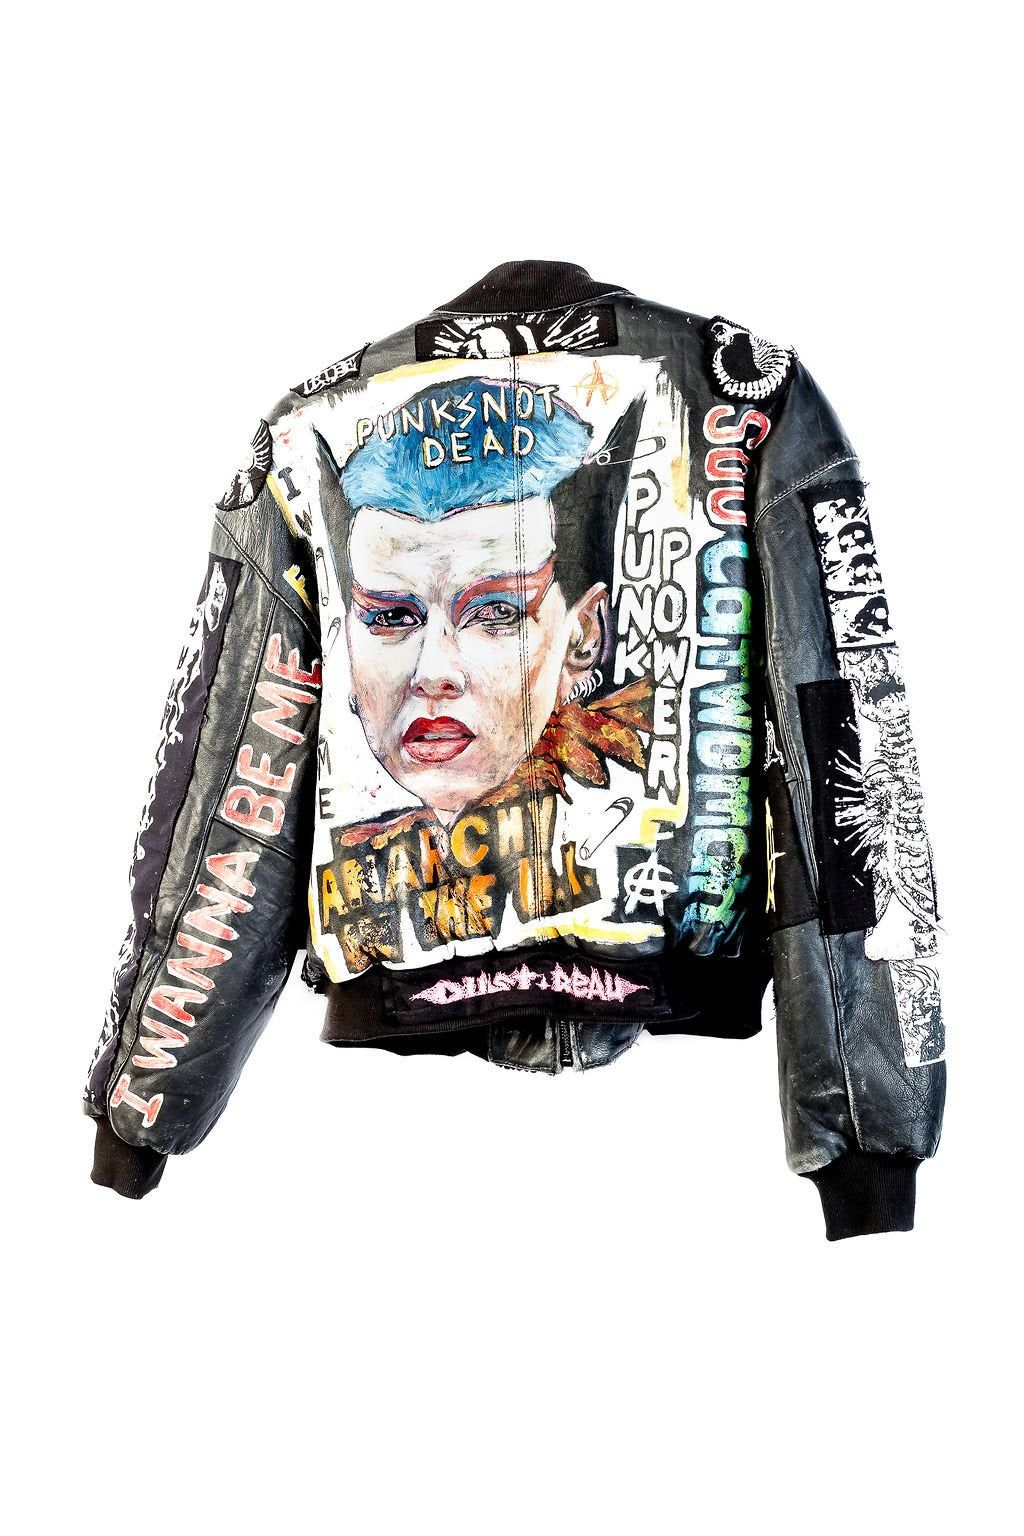 Anarchy Love Jacket Punk Fashion Battle Jacket Jackets [ 1536 x 1024 Pixel ]